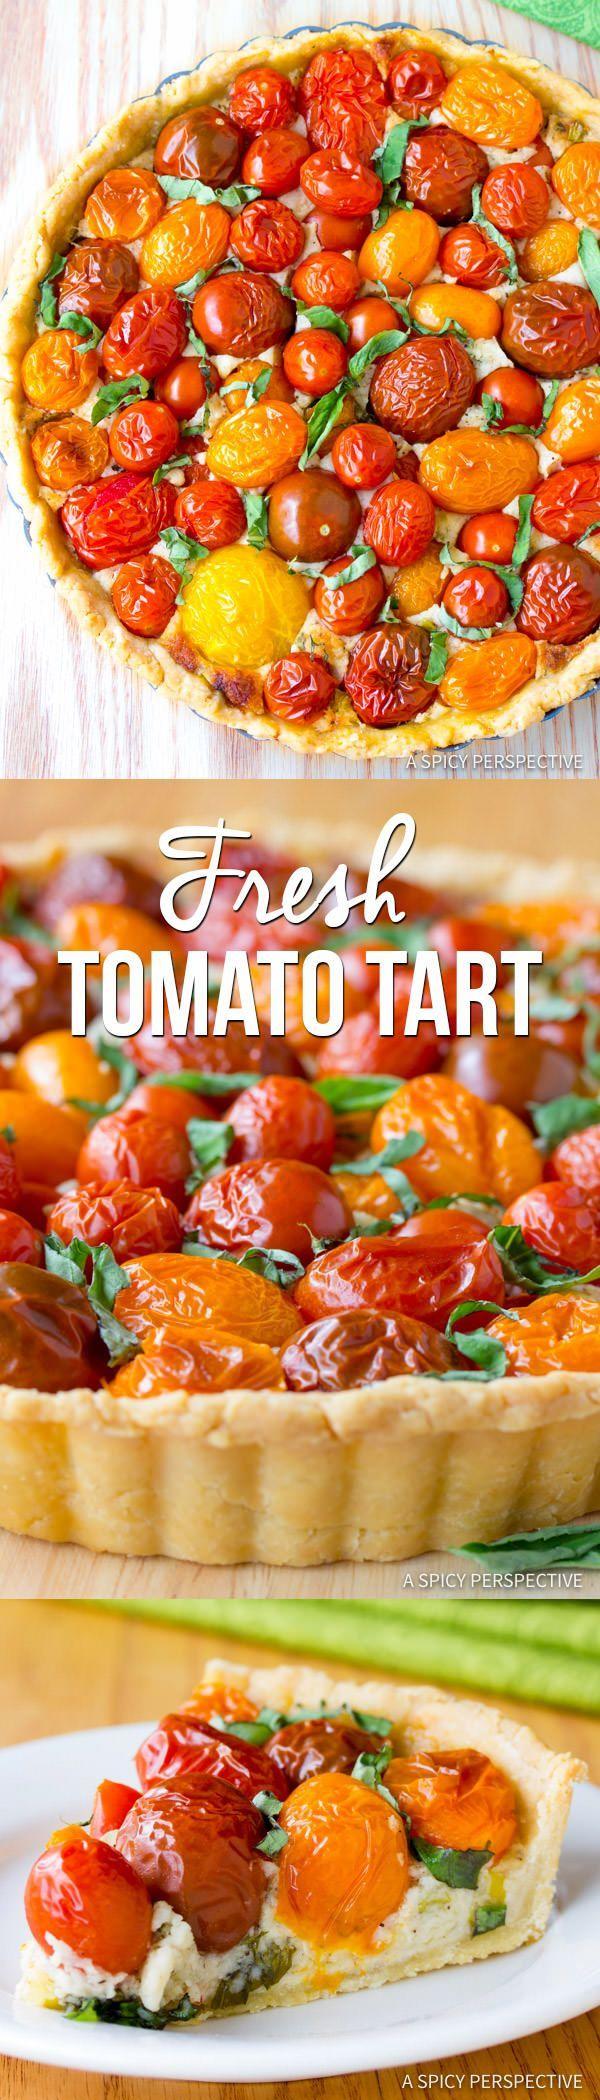 Perfect Southern Fresh Tomato Tart Recipe | http://ASpicyPerspective.com